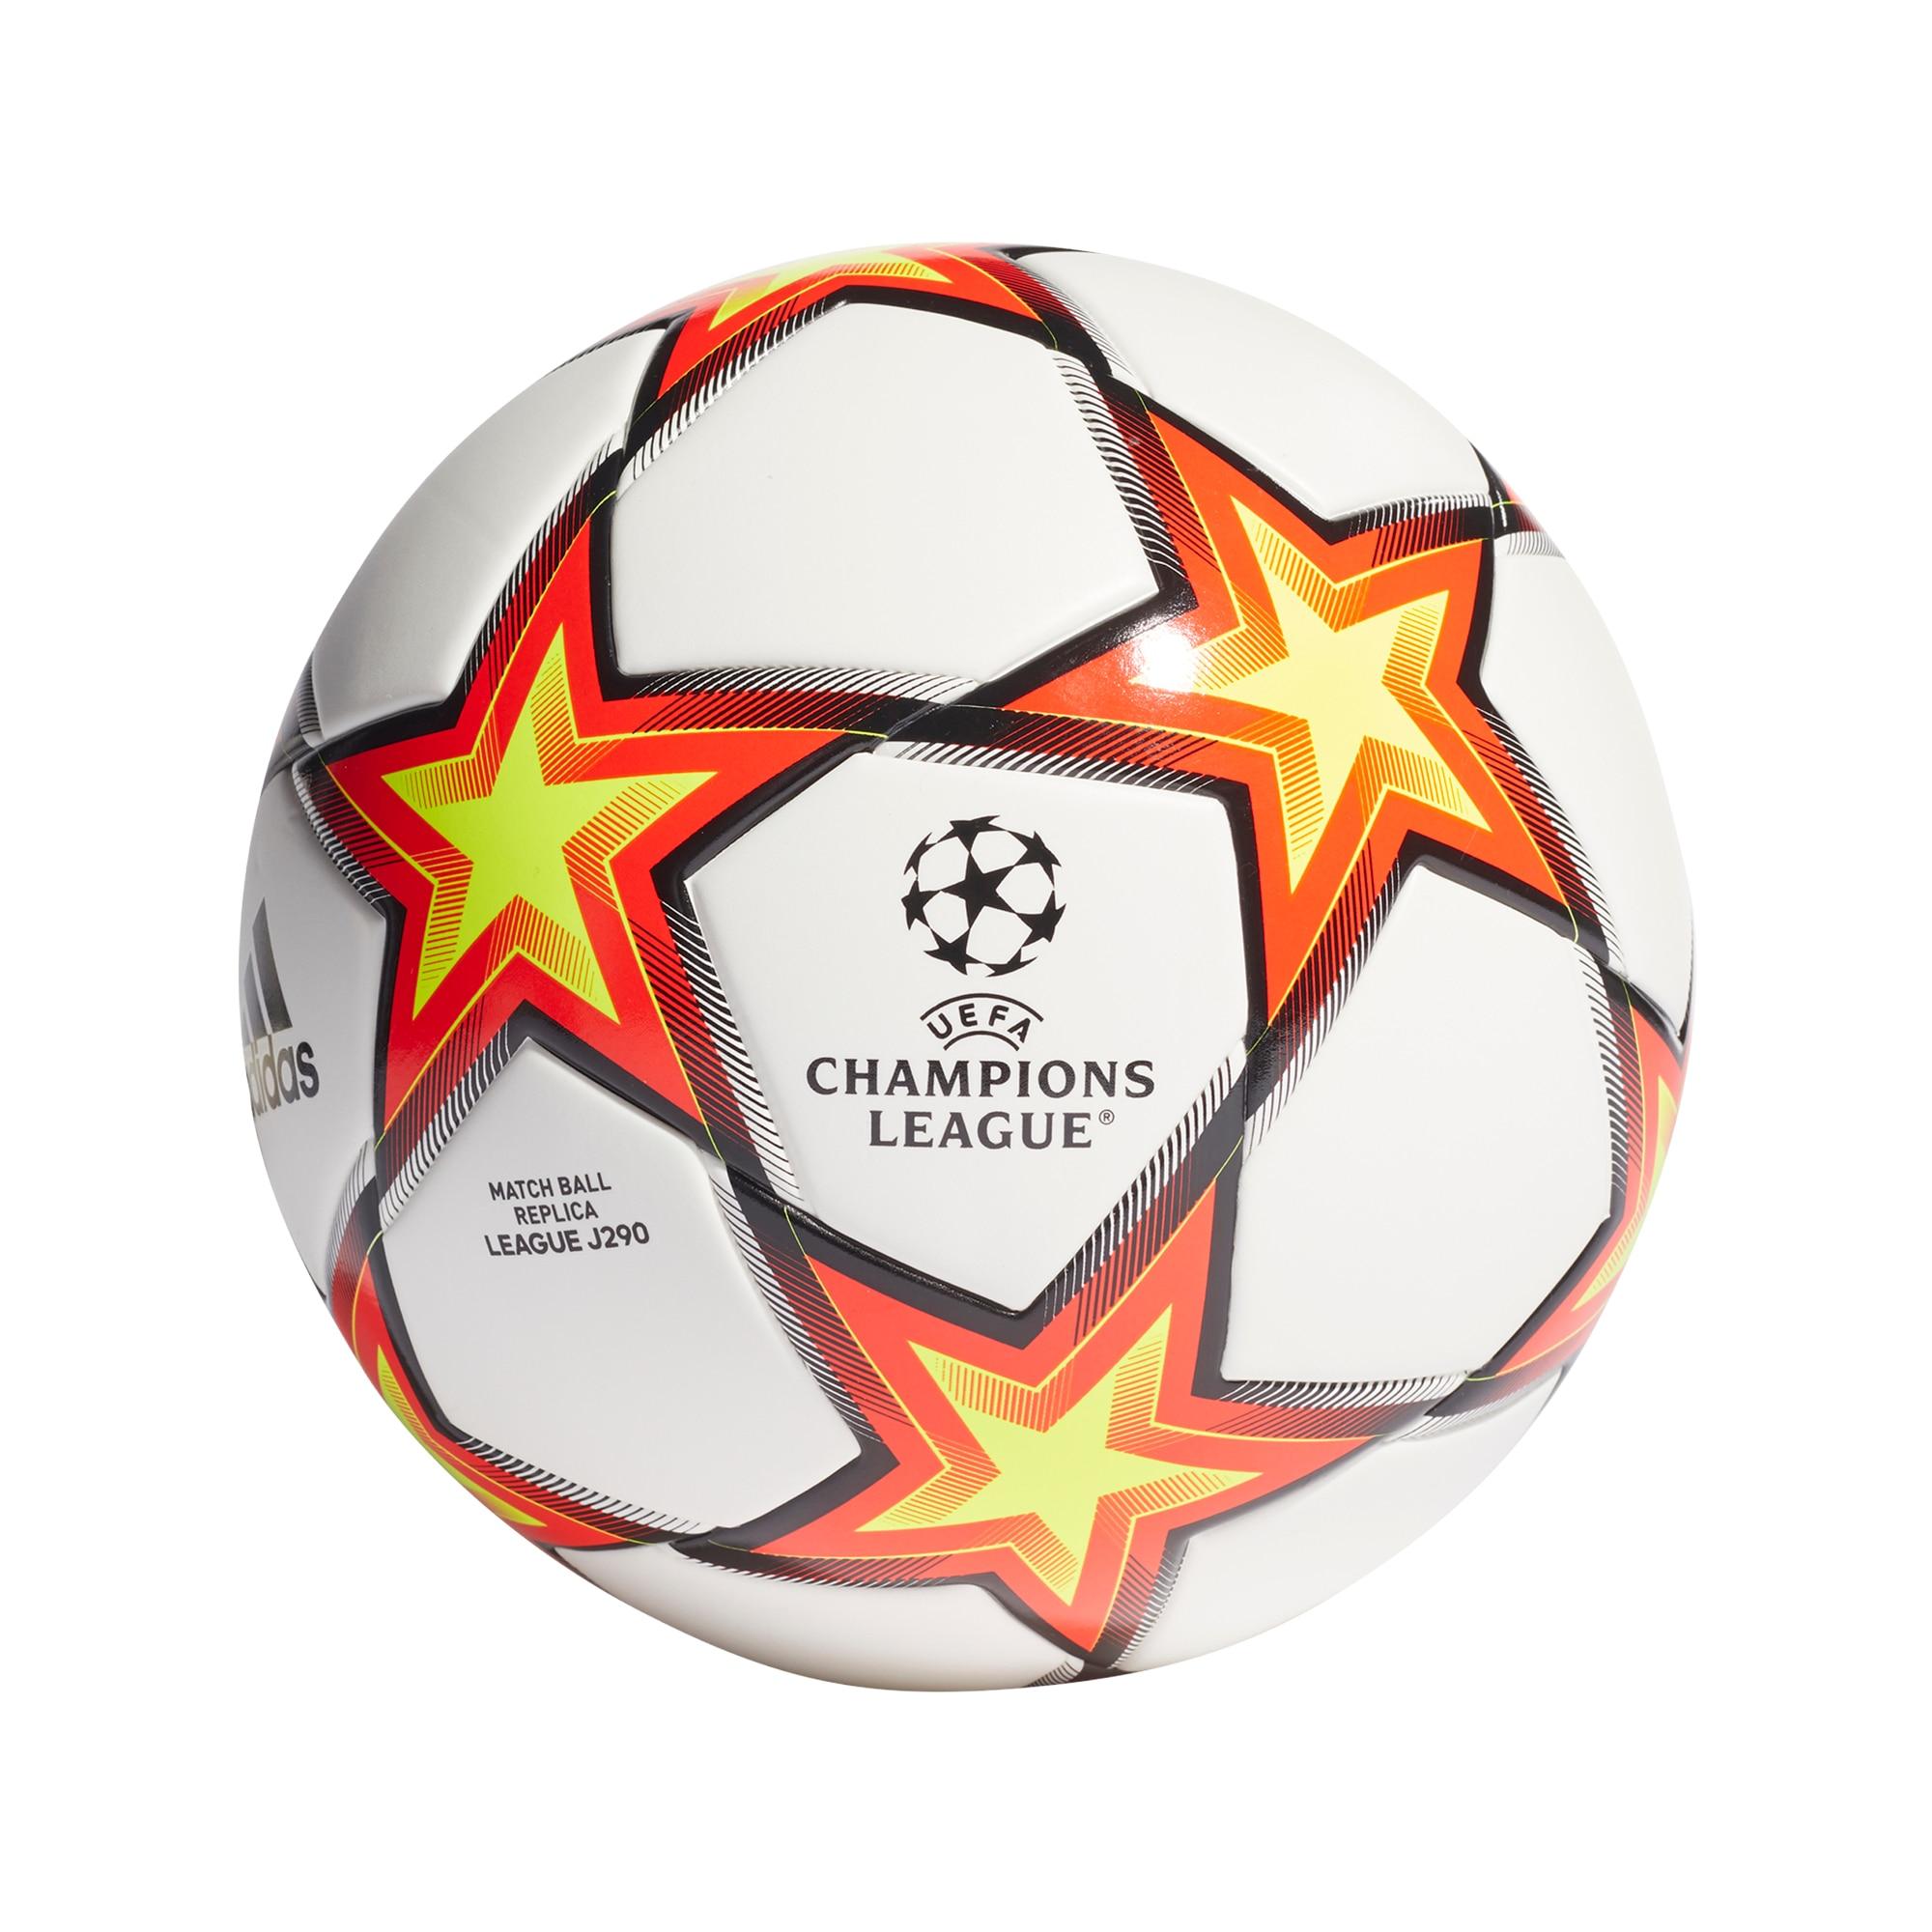 Adidas Champions League Fotball 290g Barn 21/22